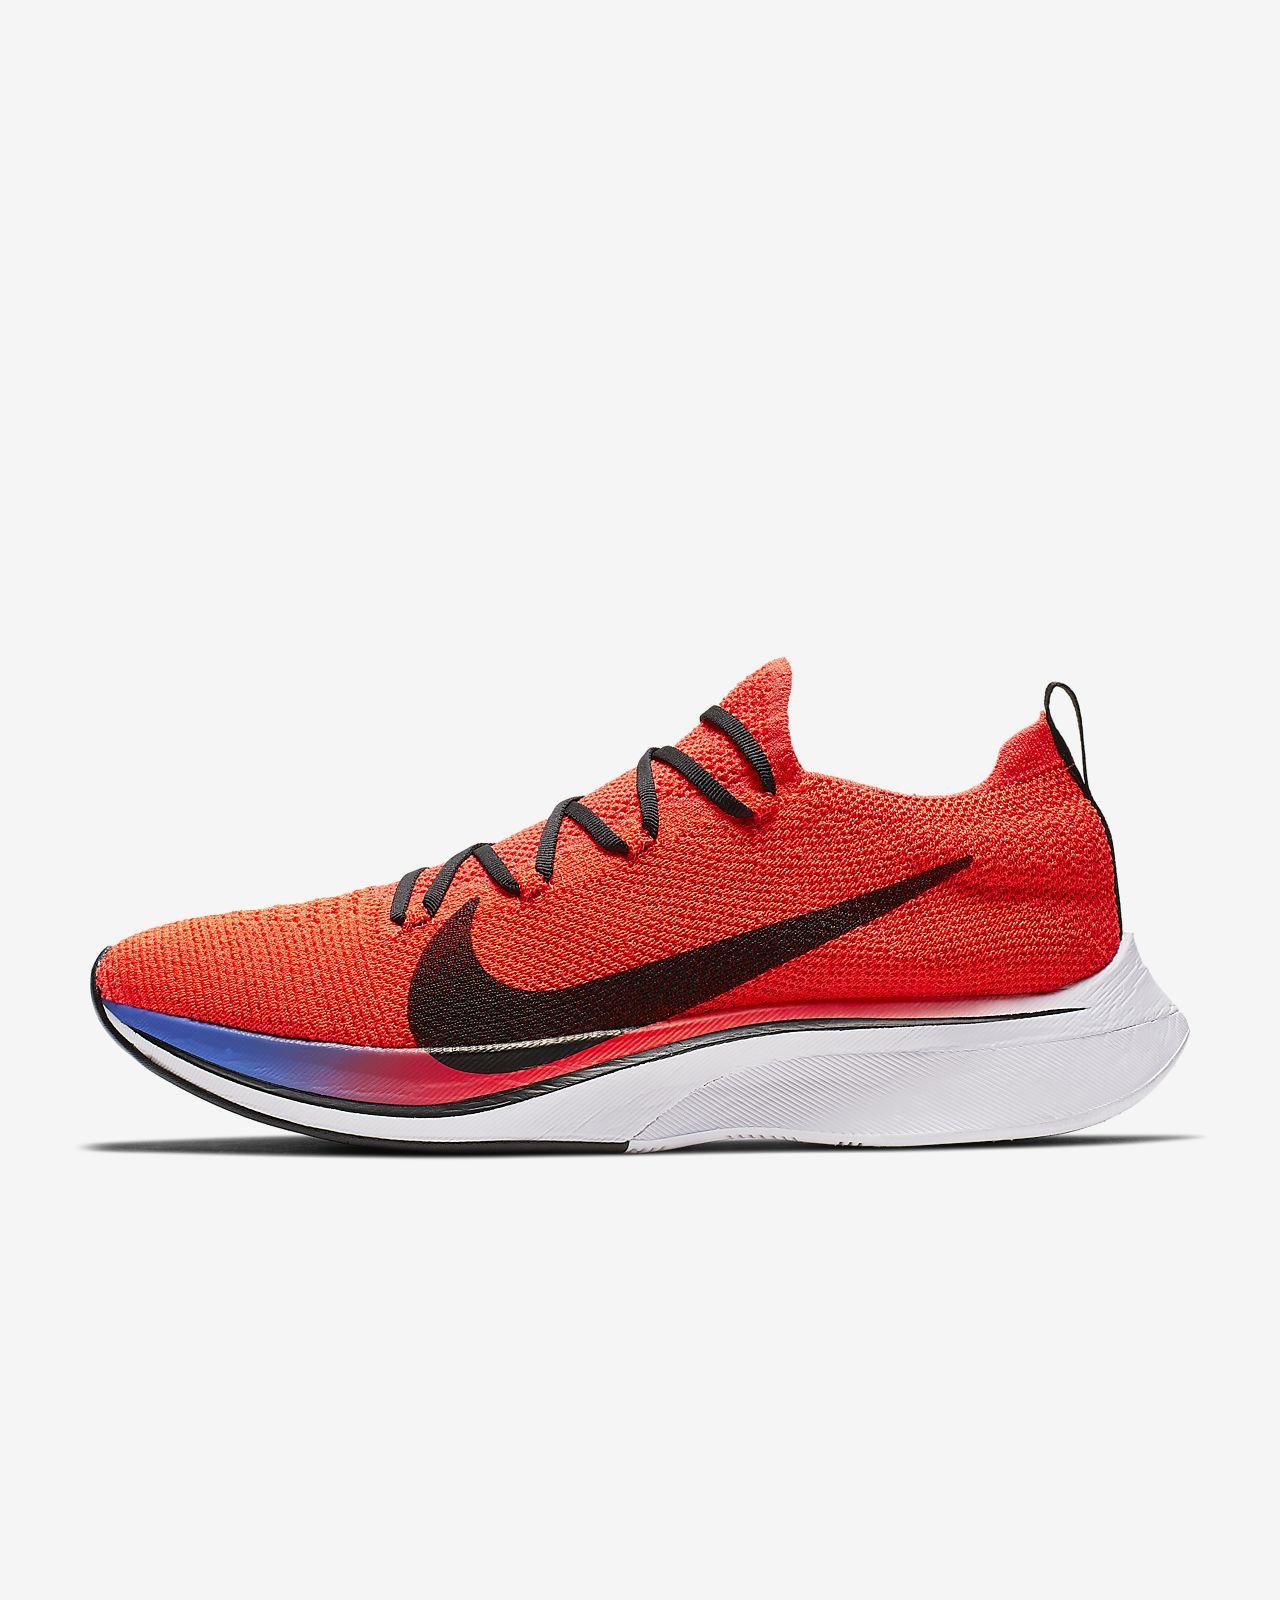 494b230bda Sapatilhas de running Nike Vaporfly 4% Flyknit. Nike.com PT